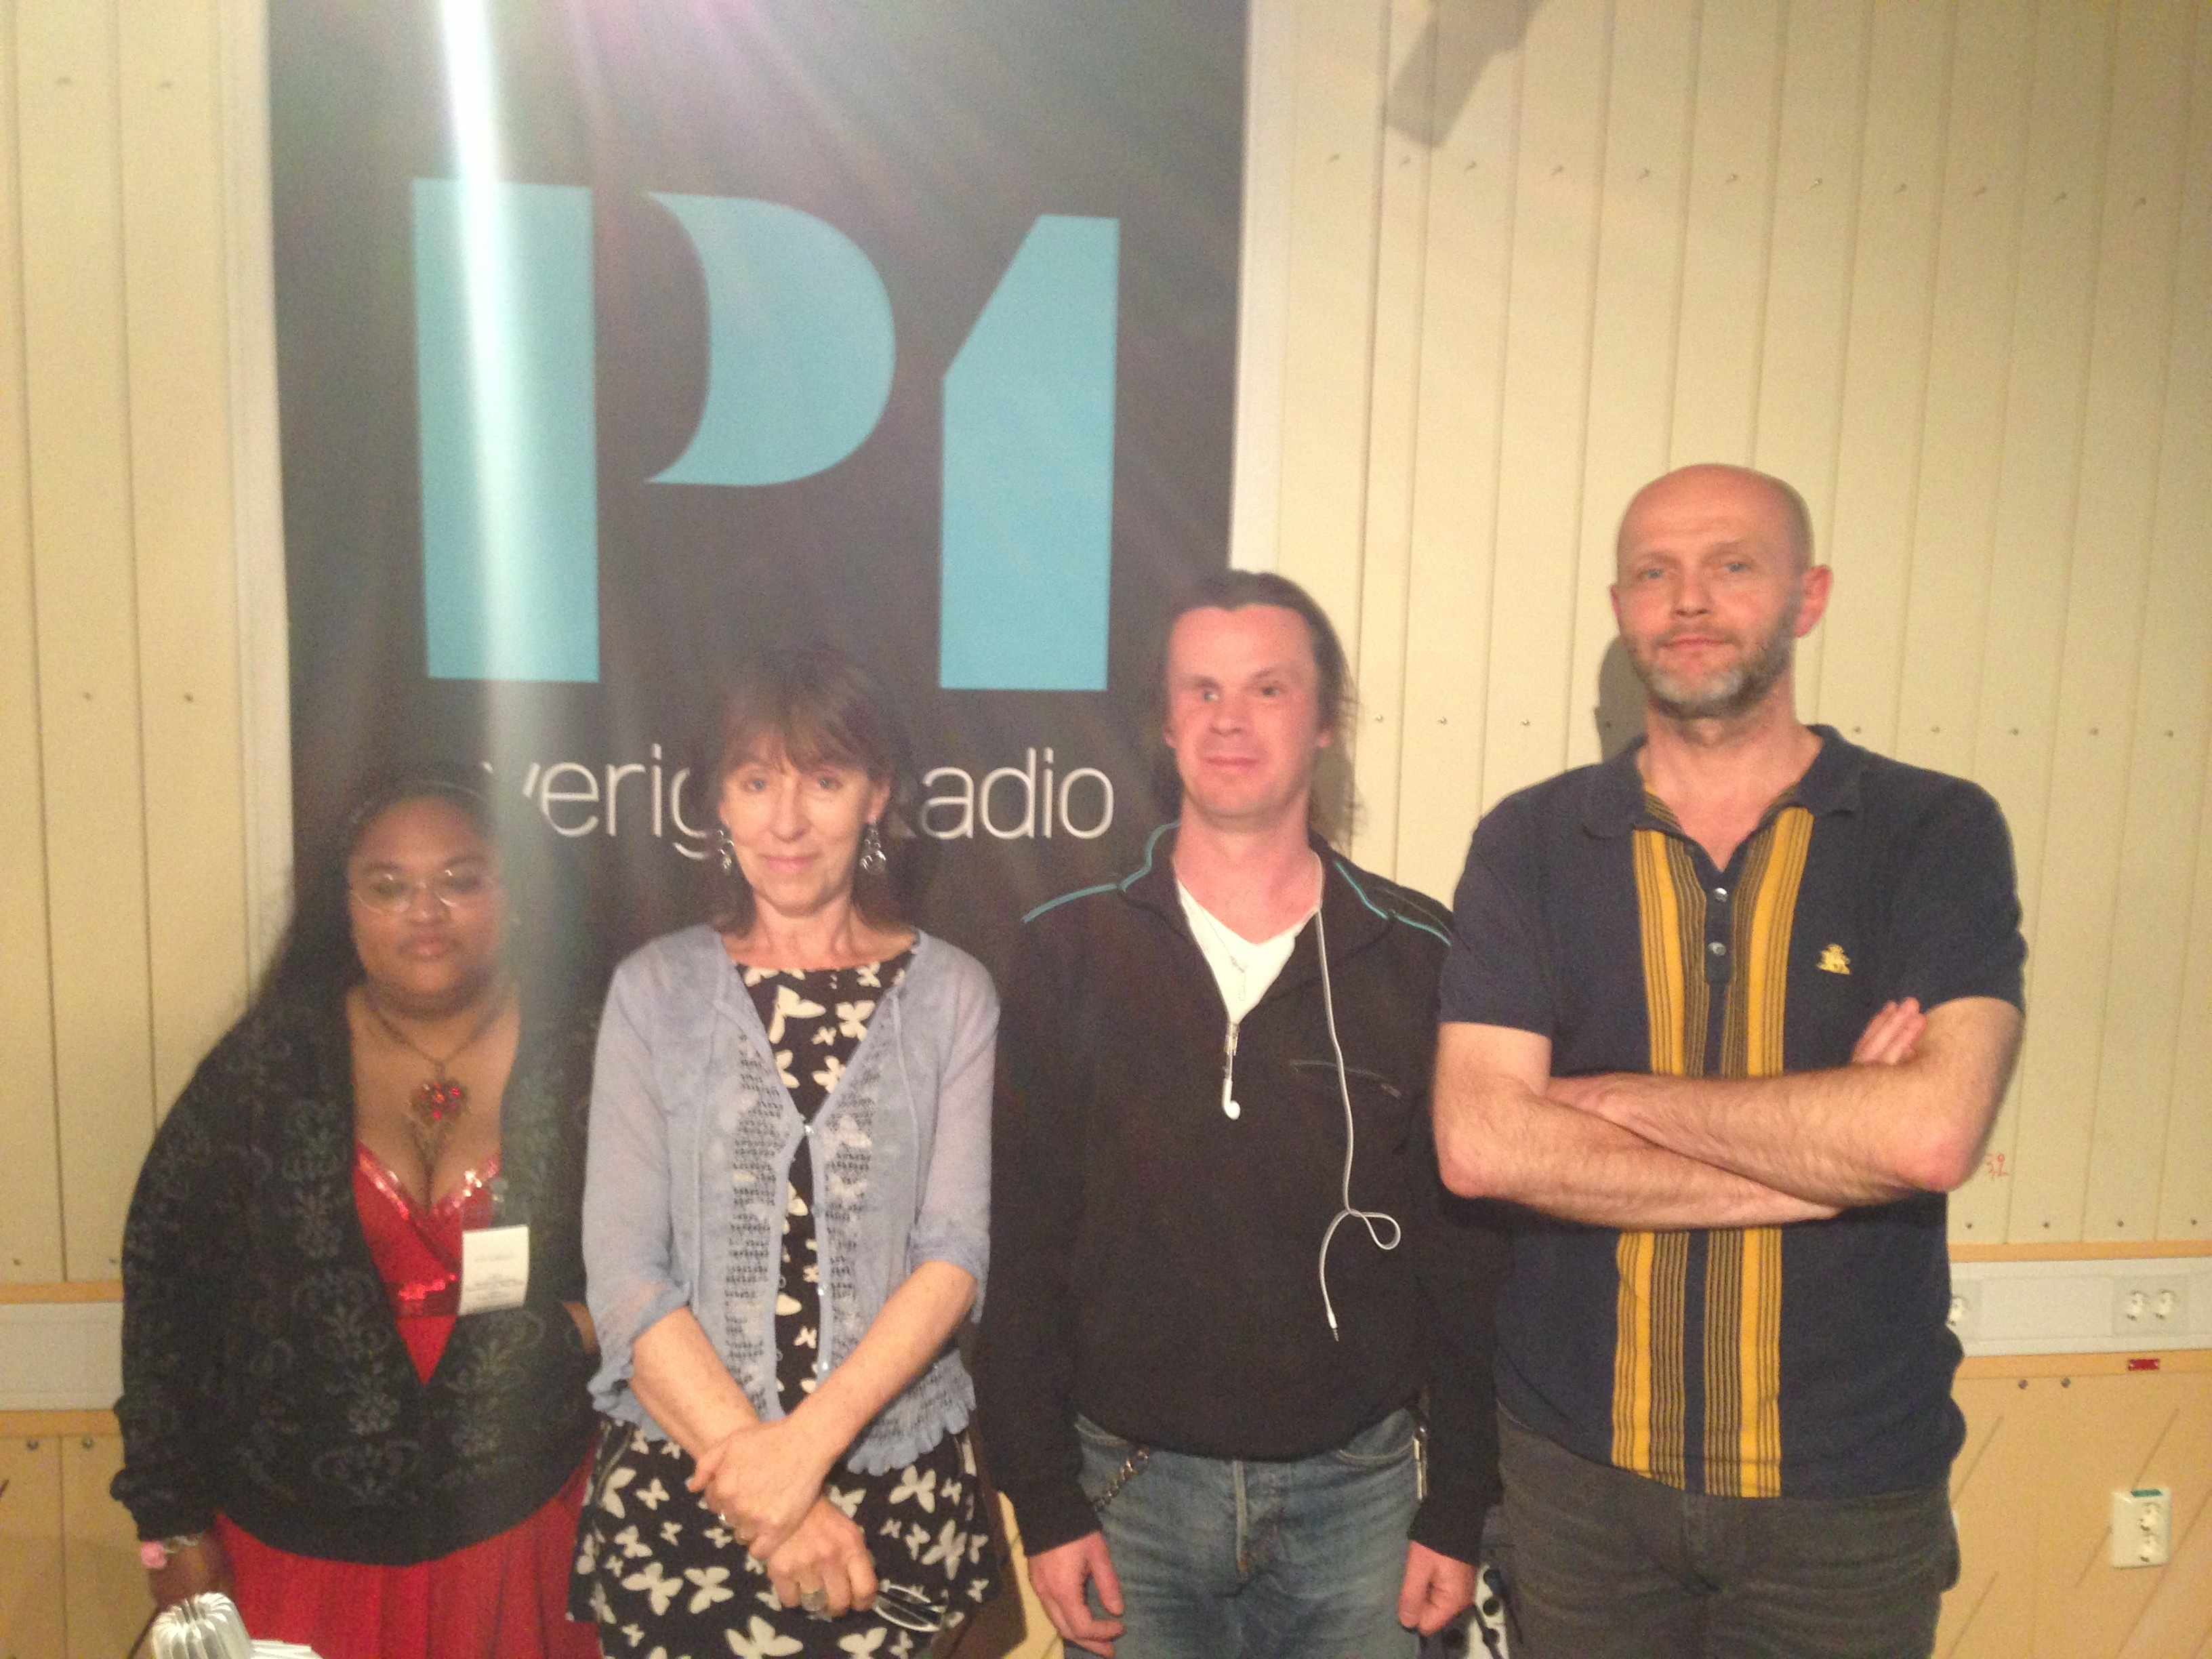 Bild: Joakim Nömell & Veronica Söderberg i Studio 1 i P1